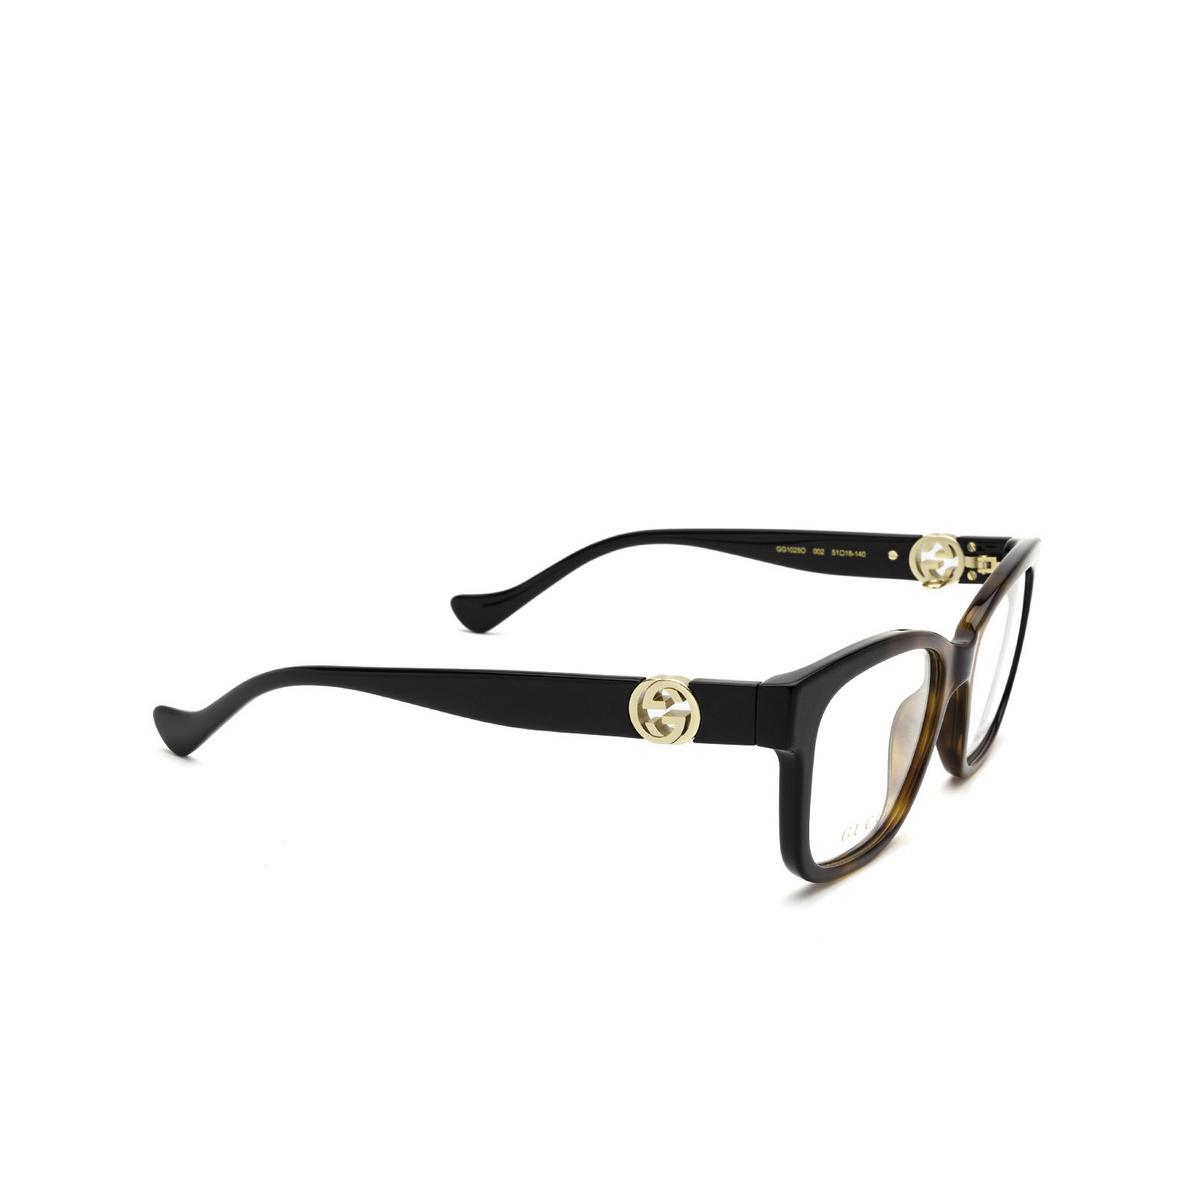 Gucci® Square Eyeglasses: GG1025O color Black & Havana 002 - three-quarters view.